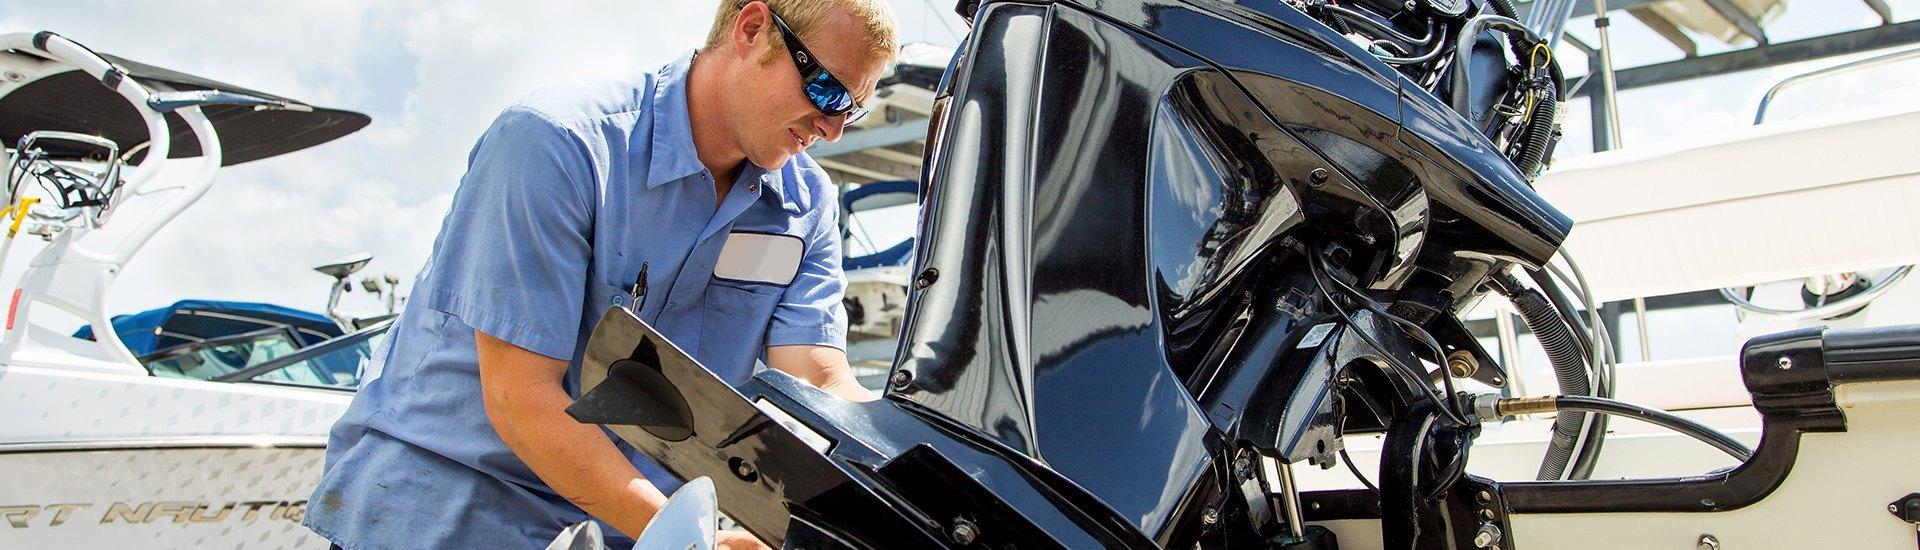 Boating & Marine Parts | Motors, Propellers, Bilge Pumps